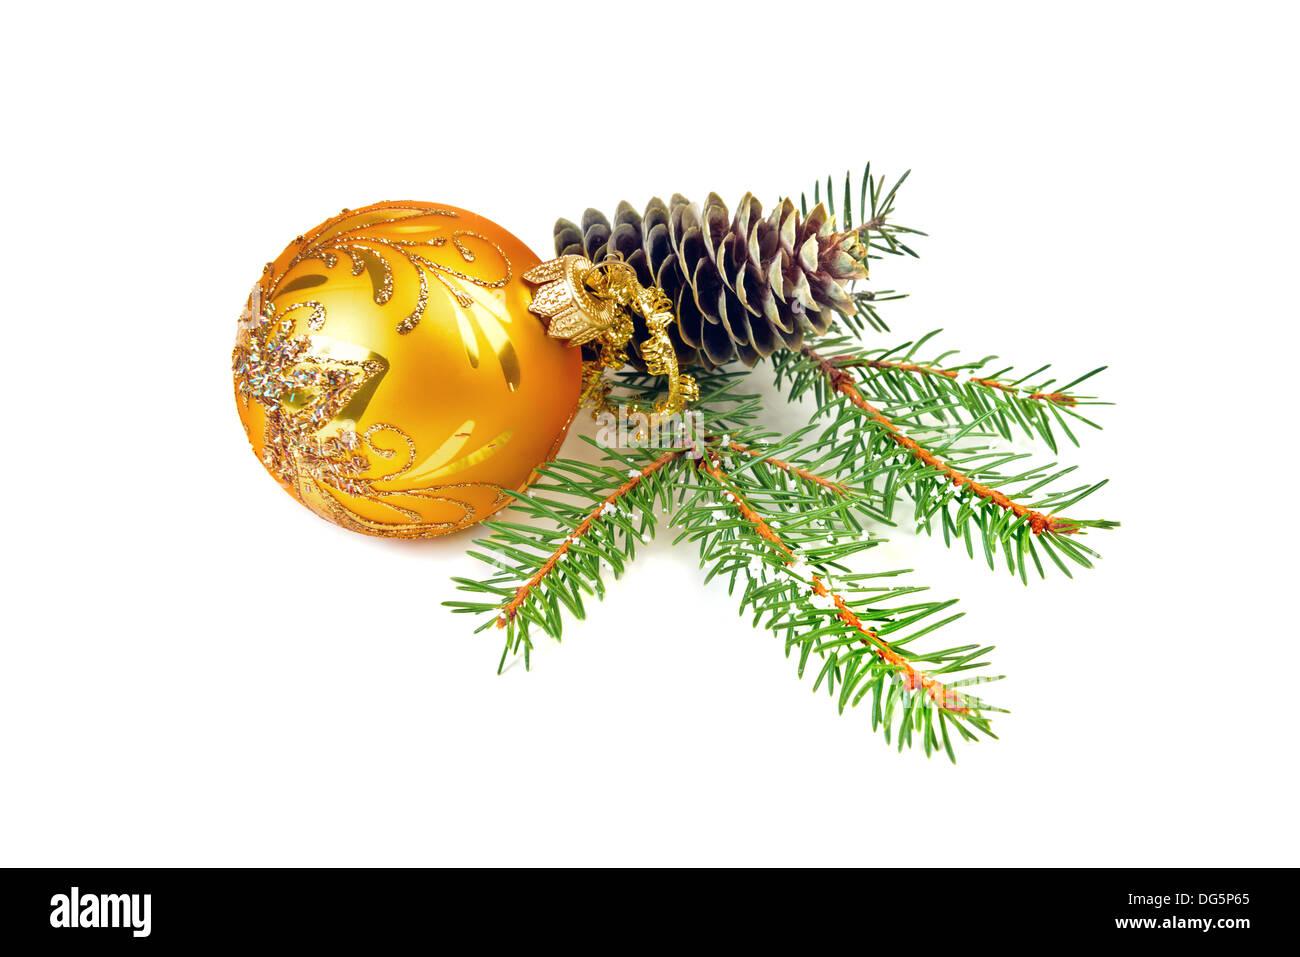 Christmas ball and pine tree branch decoration - Stock Image